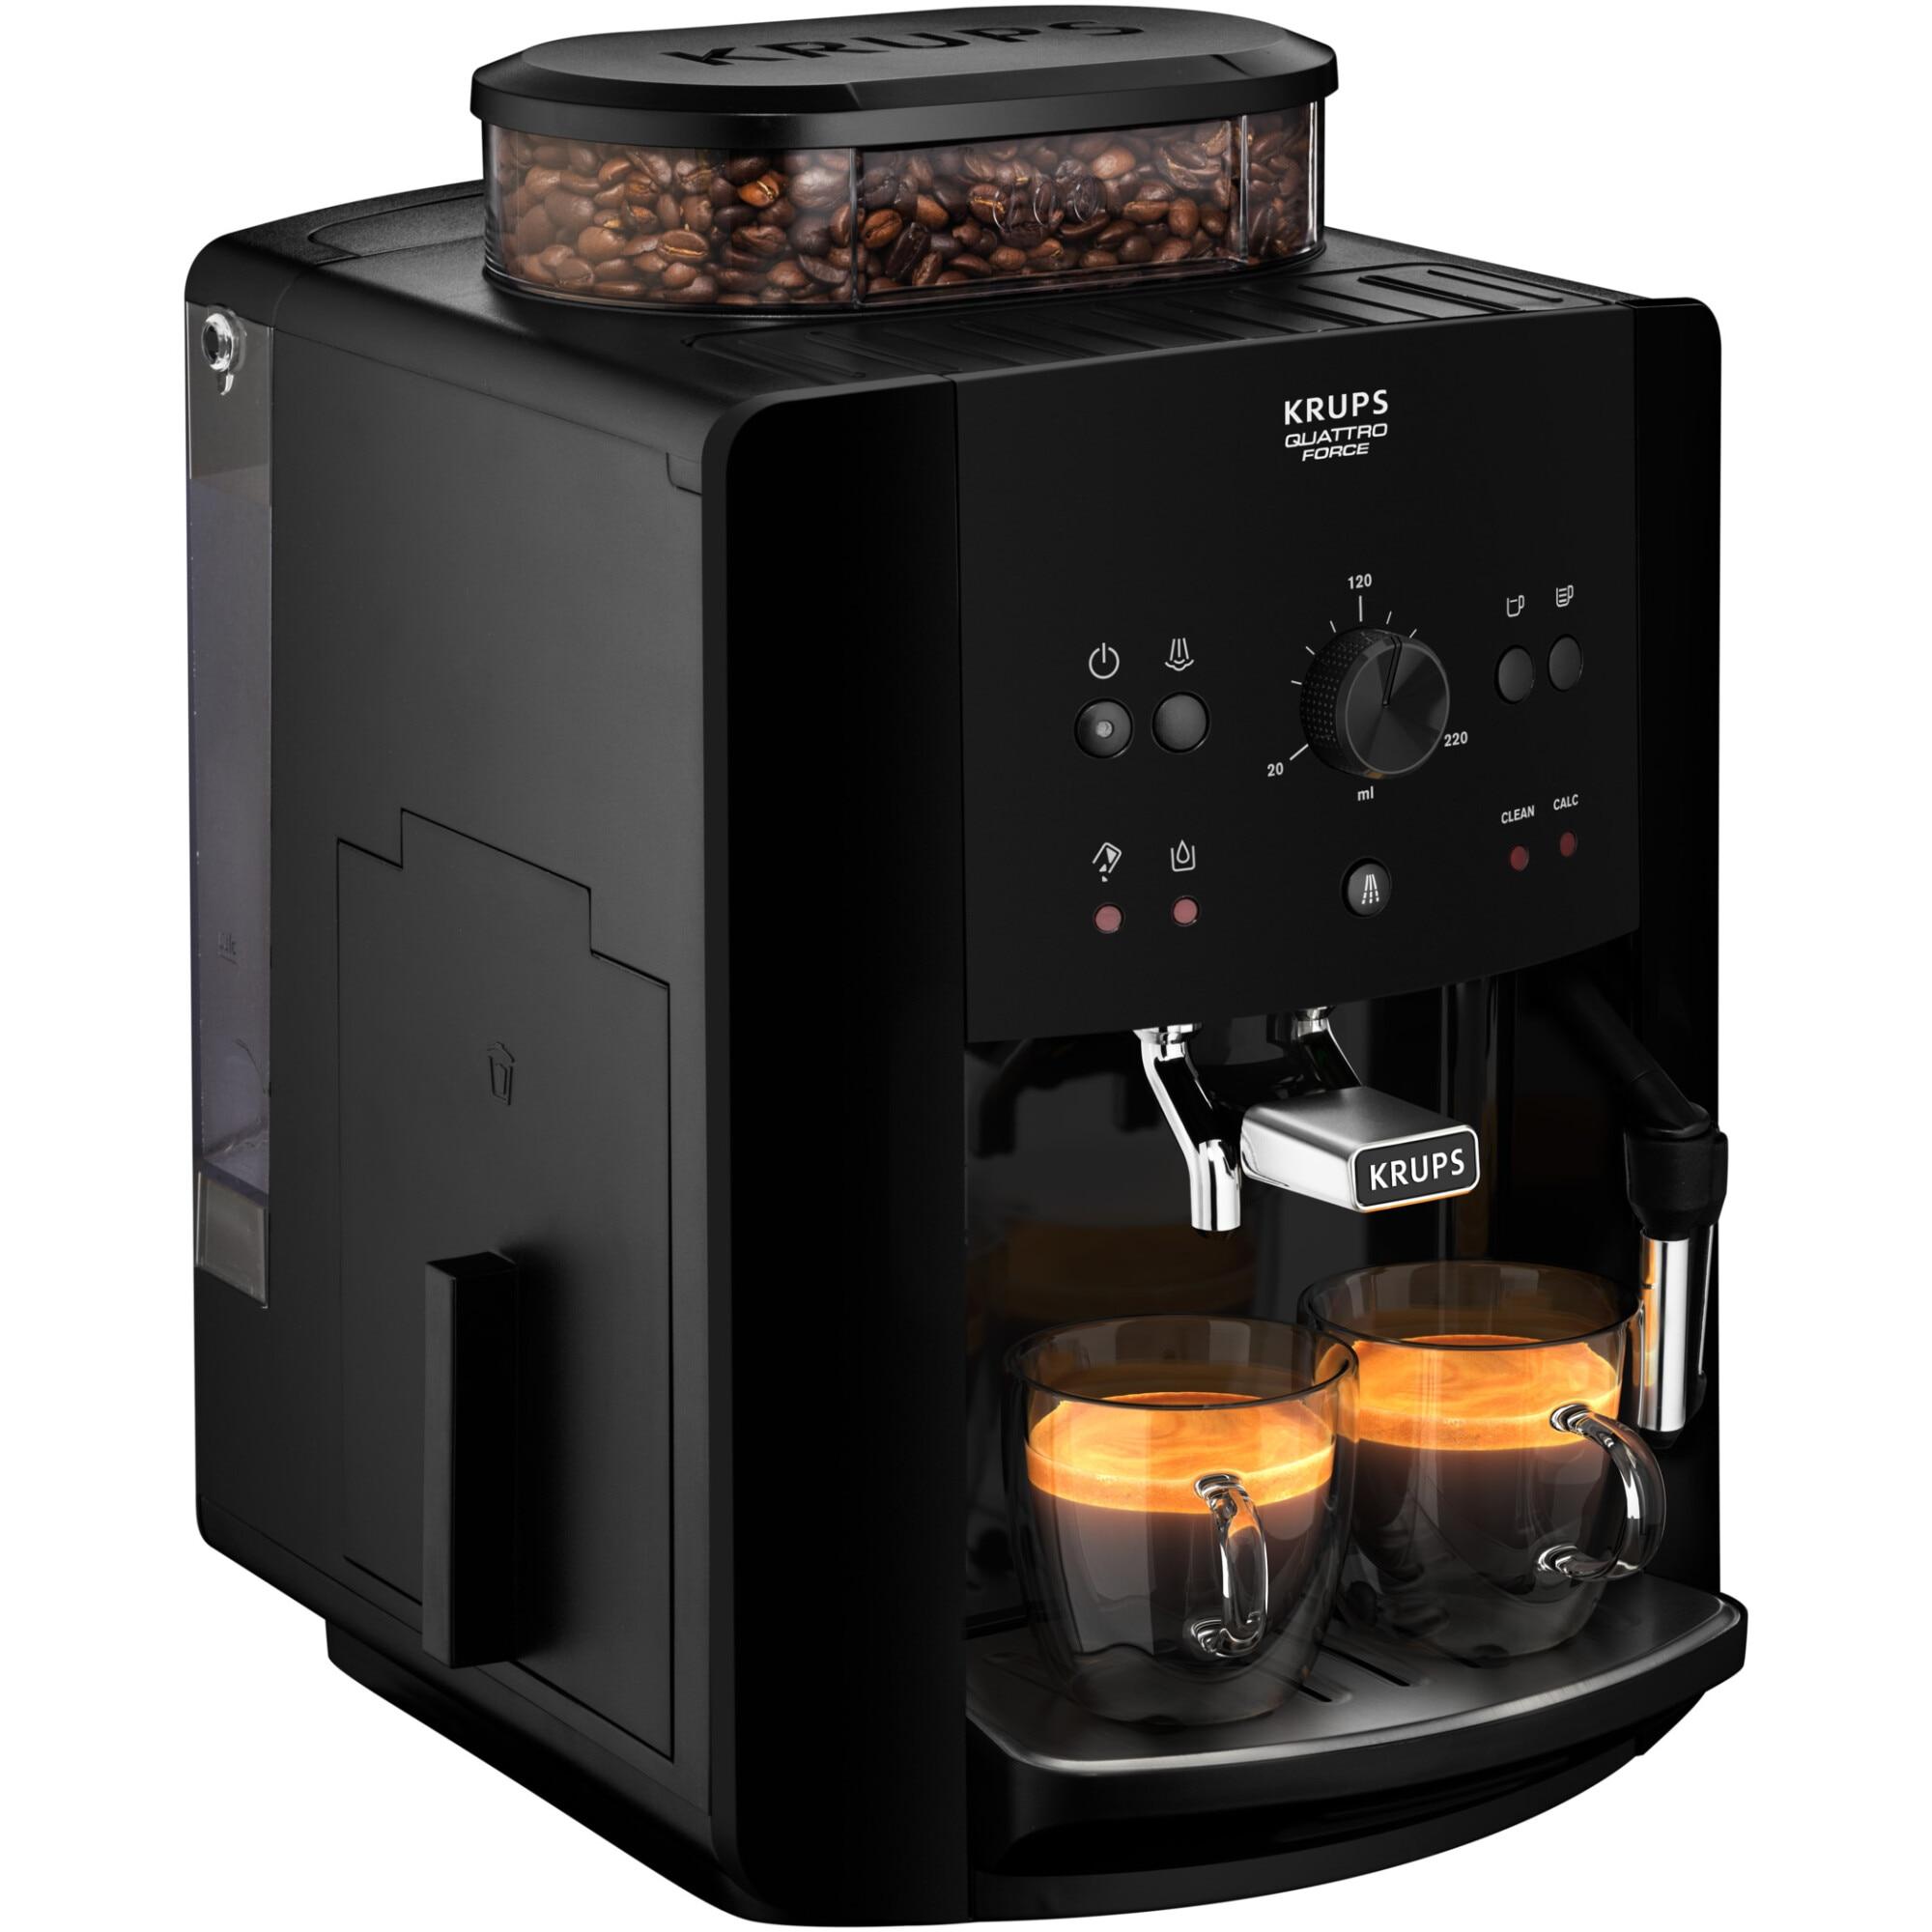 Fotografie Espressor automat Krups Picto Arabica EA811010, 1450W, 15bari, rezervor boabe 260g, rezervor apa 1.7L, rasnita 3 nivele, Negru